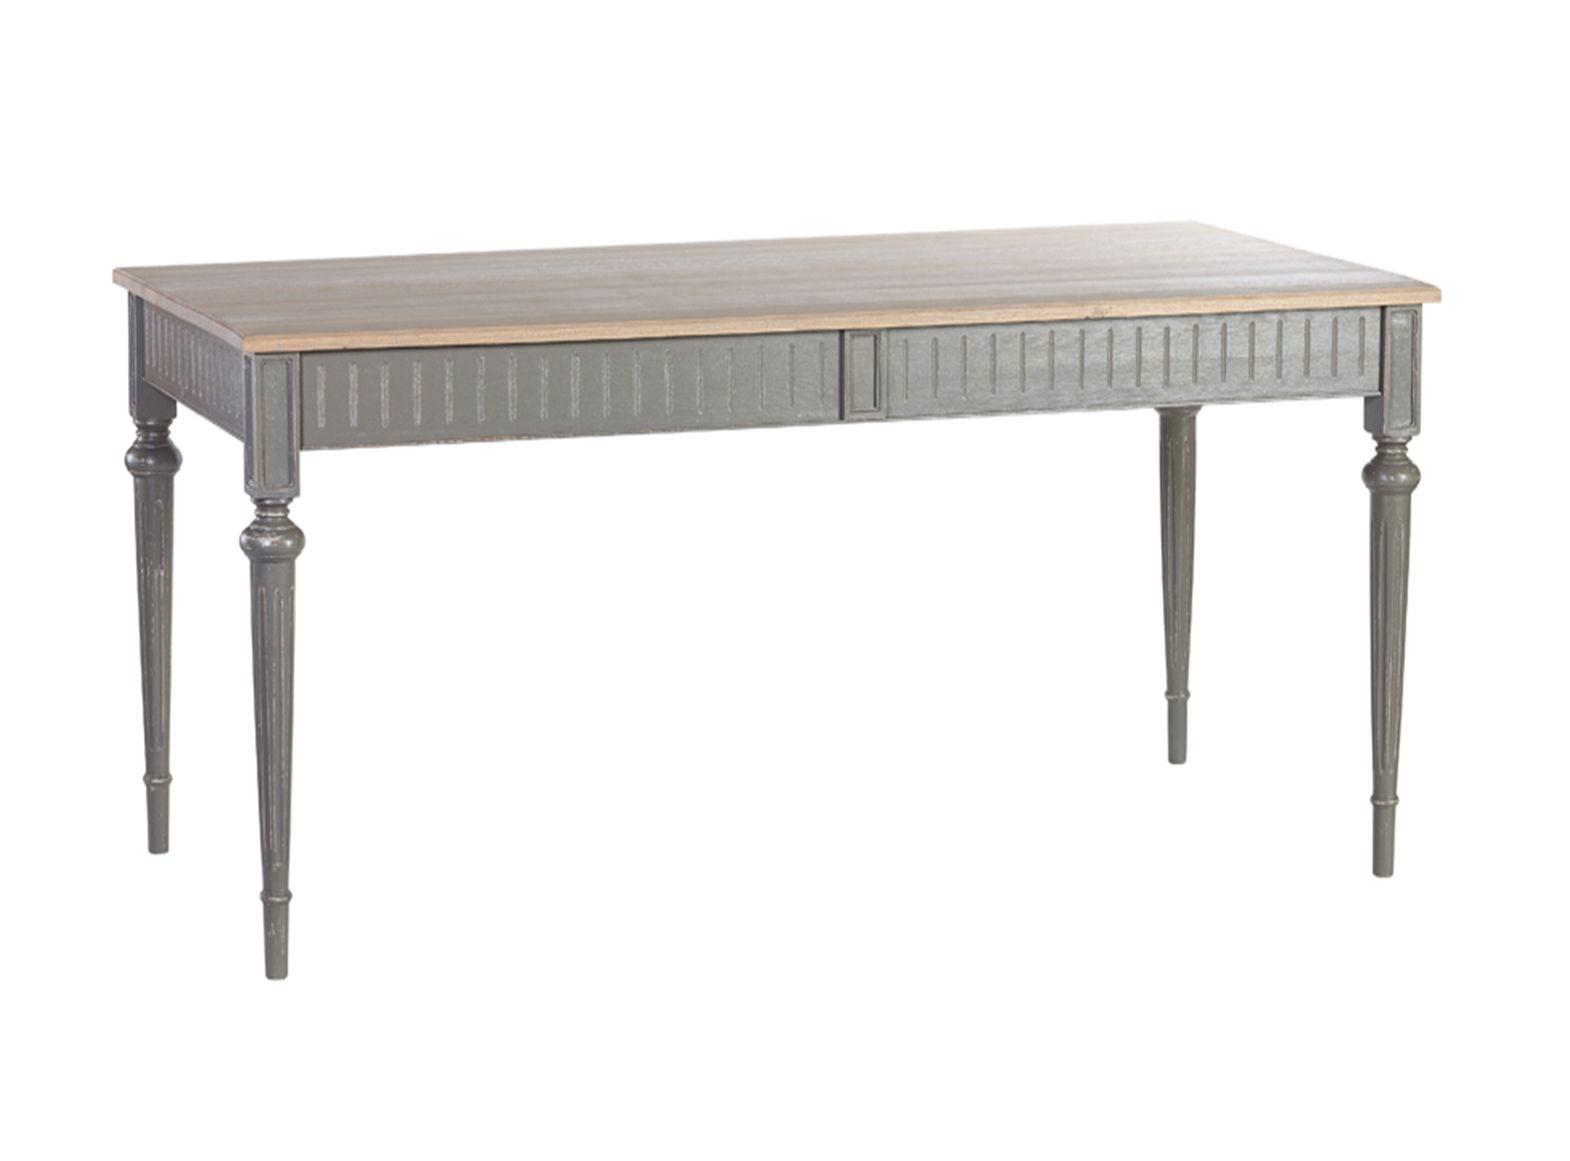 Table repas signature michel ange - Signature meubles ...